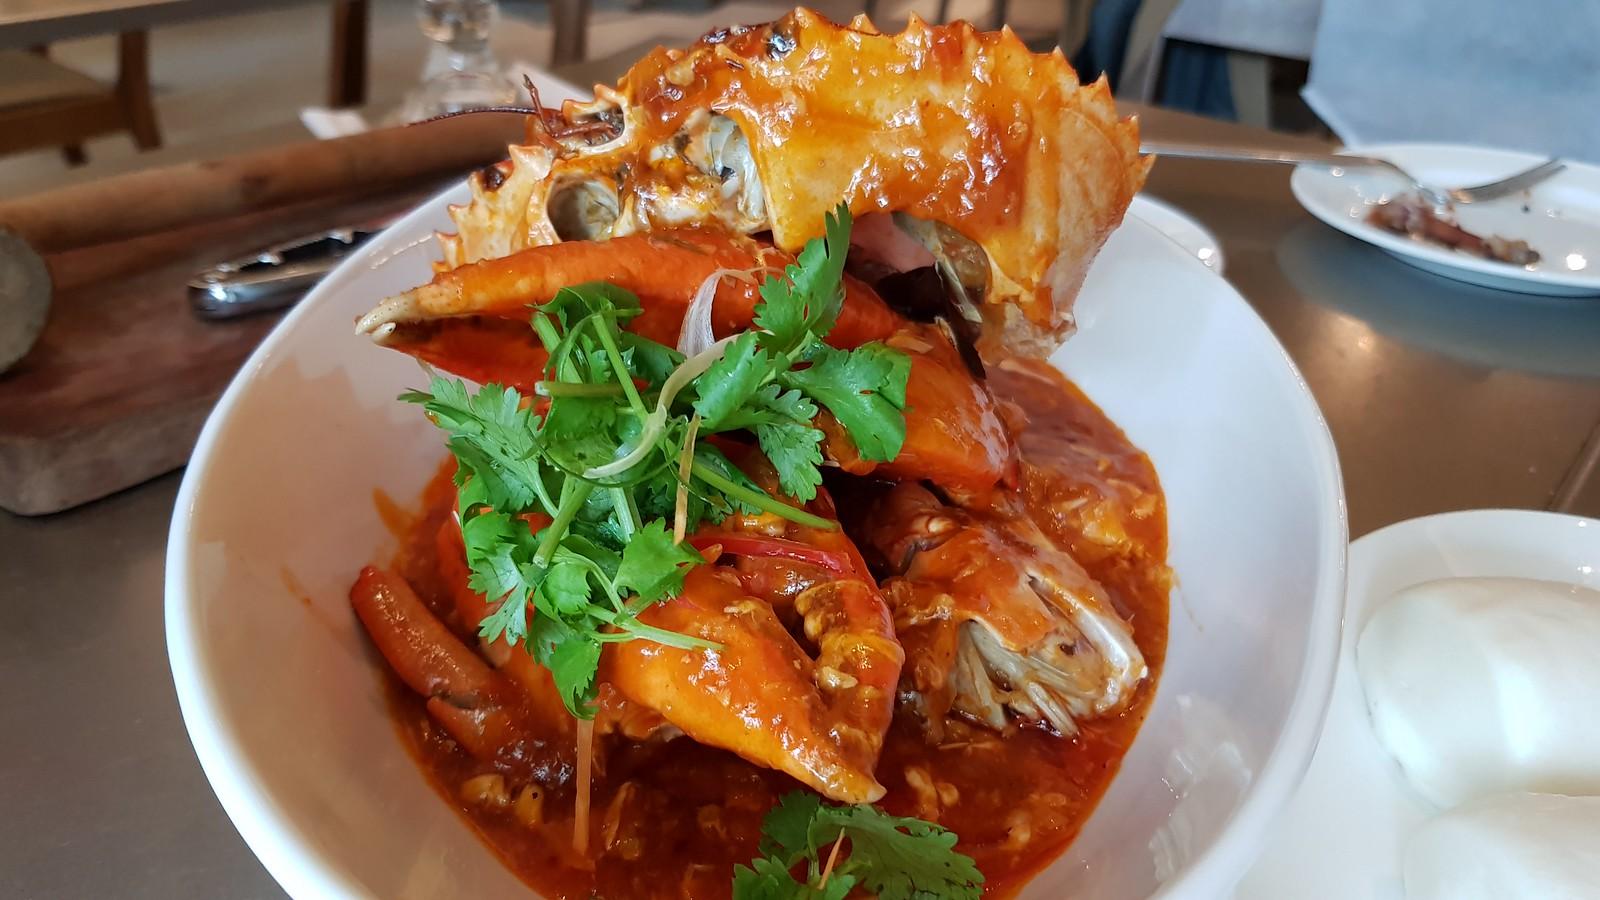 2. chilli crab